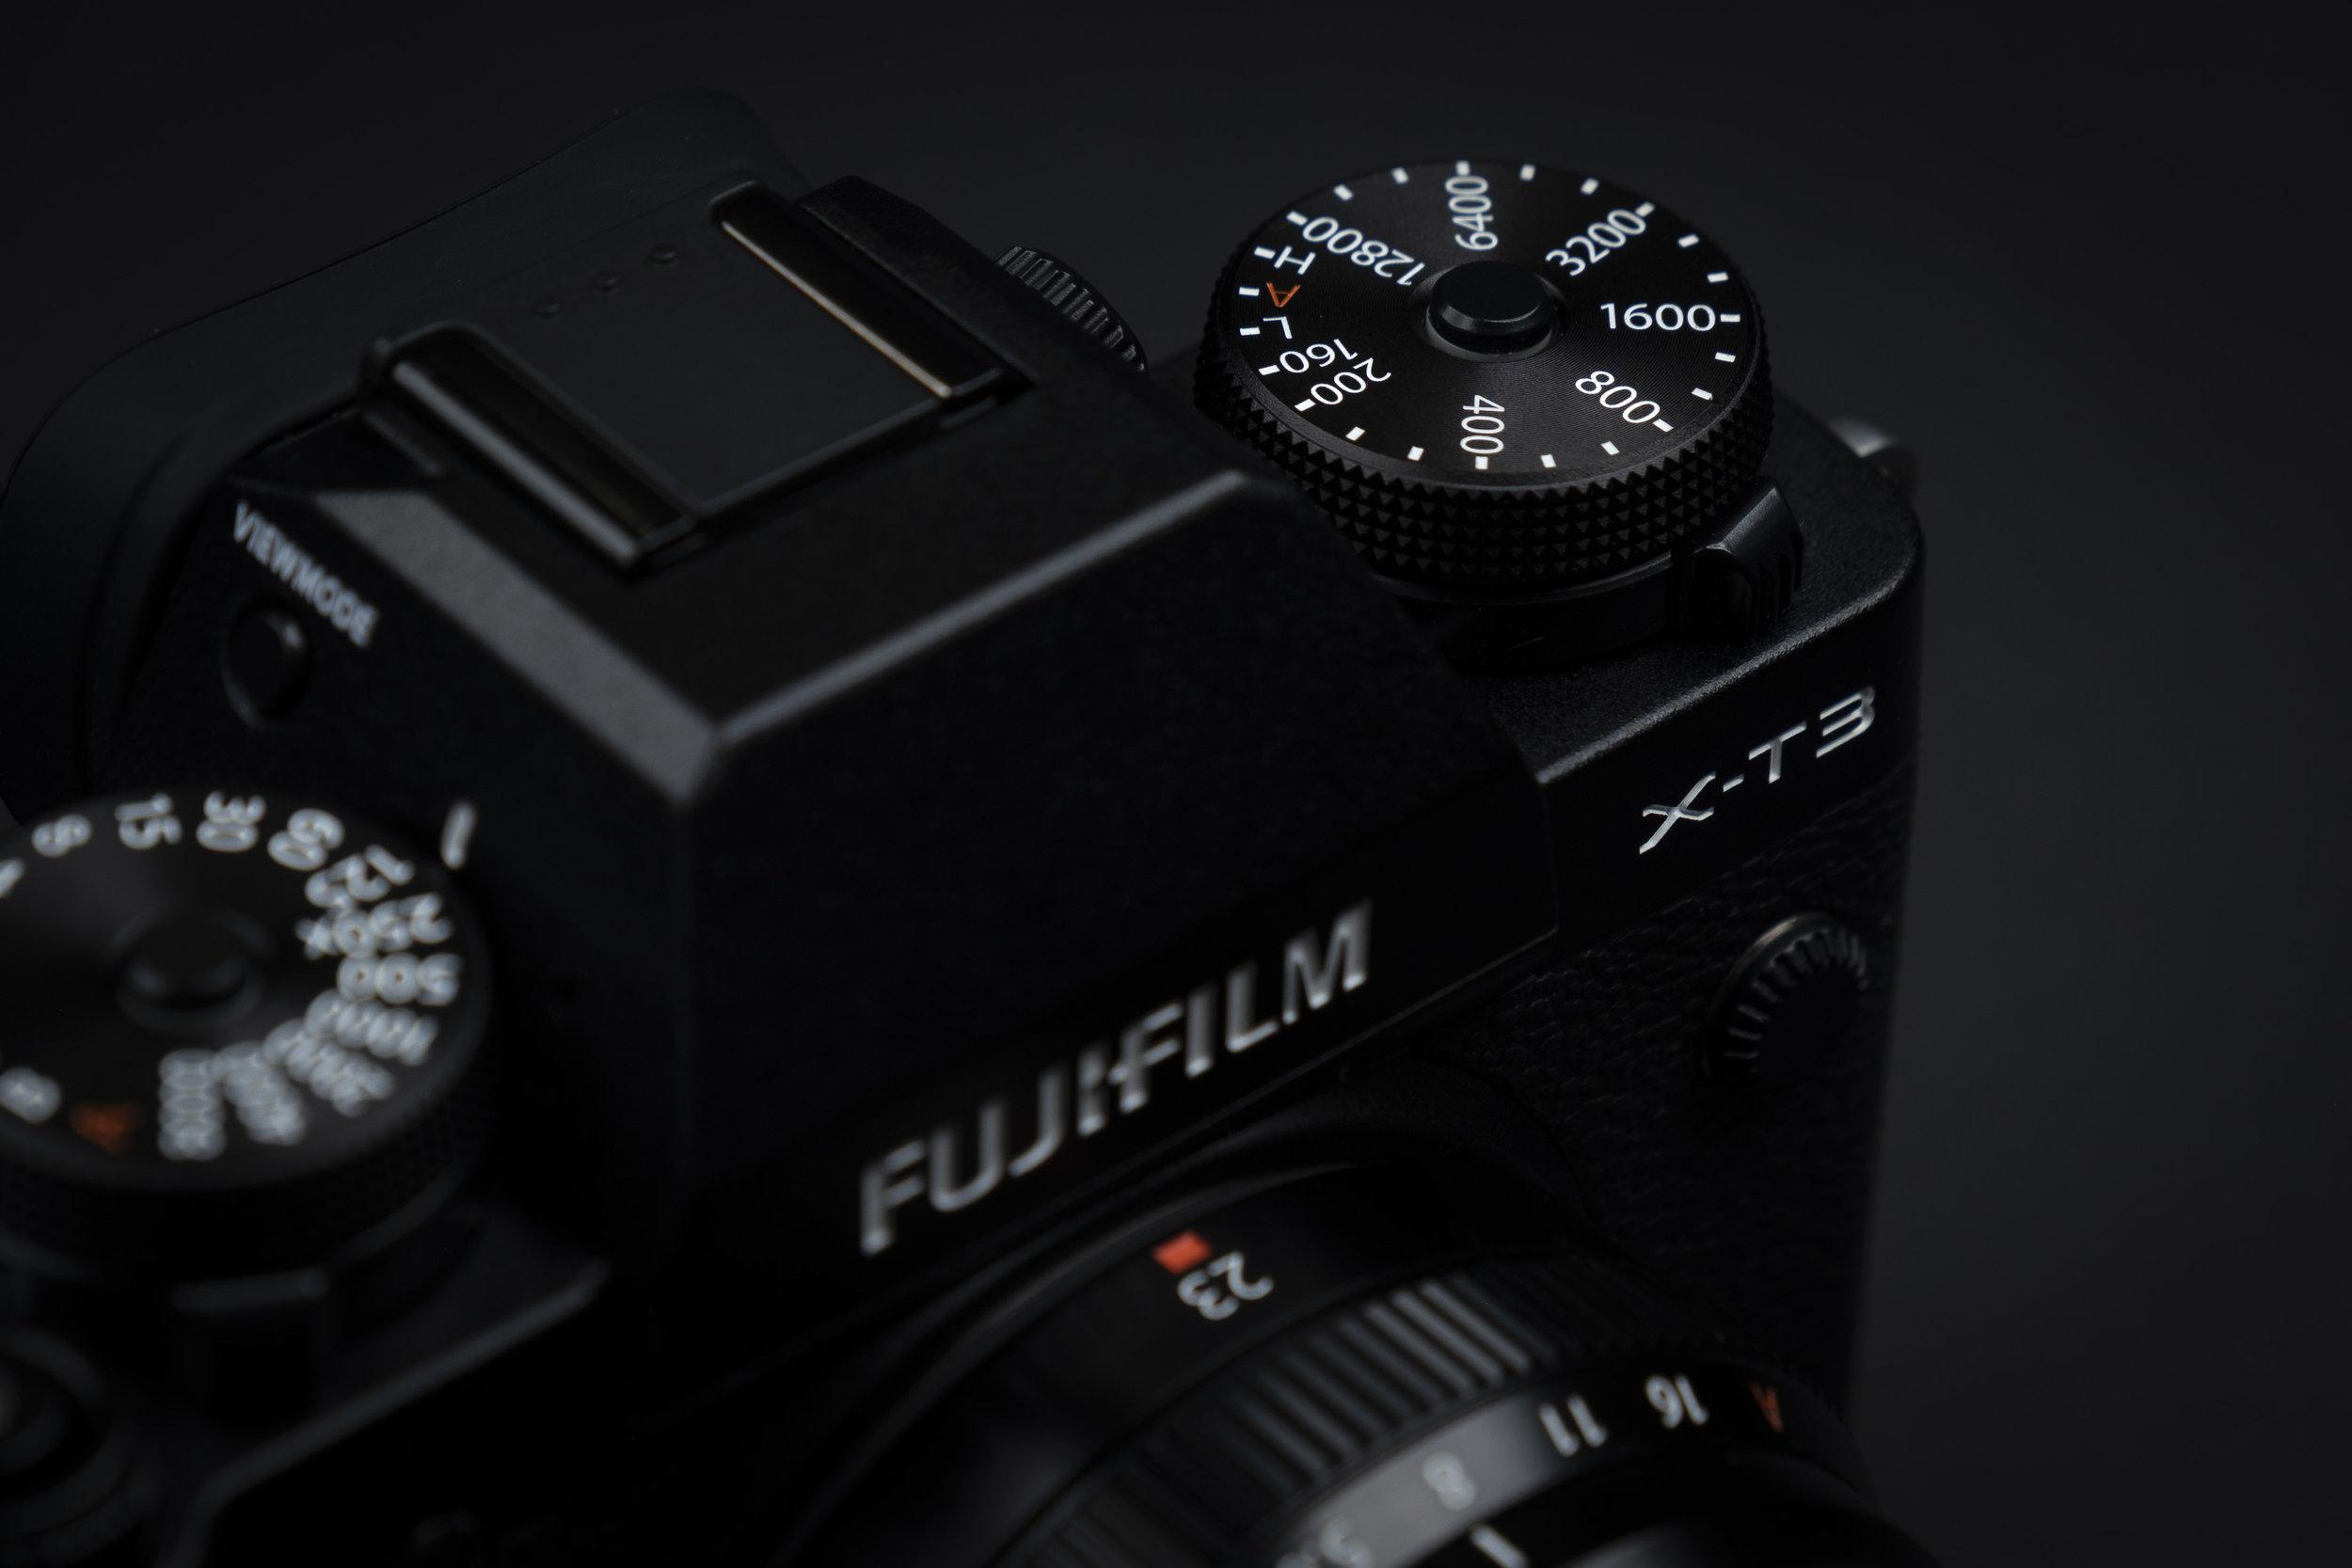 FUJIFILM-X-T3-REVIEW-CAMERA-lr-6.jpg